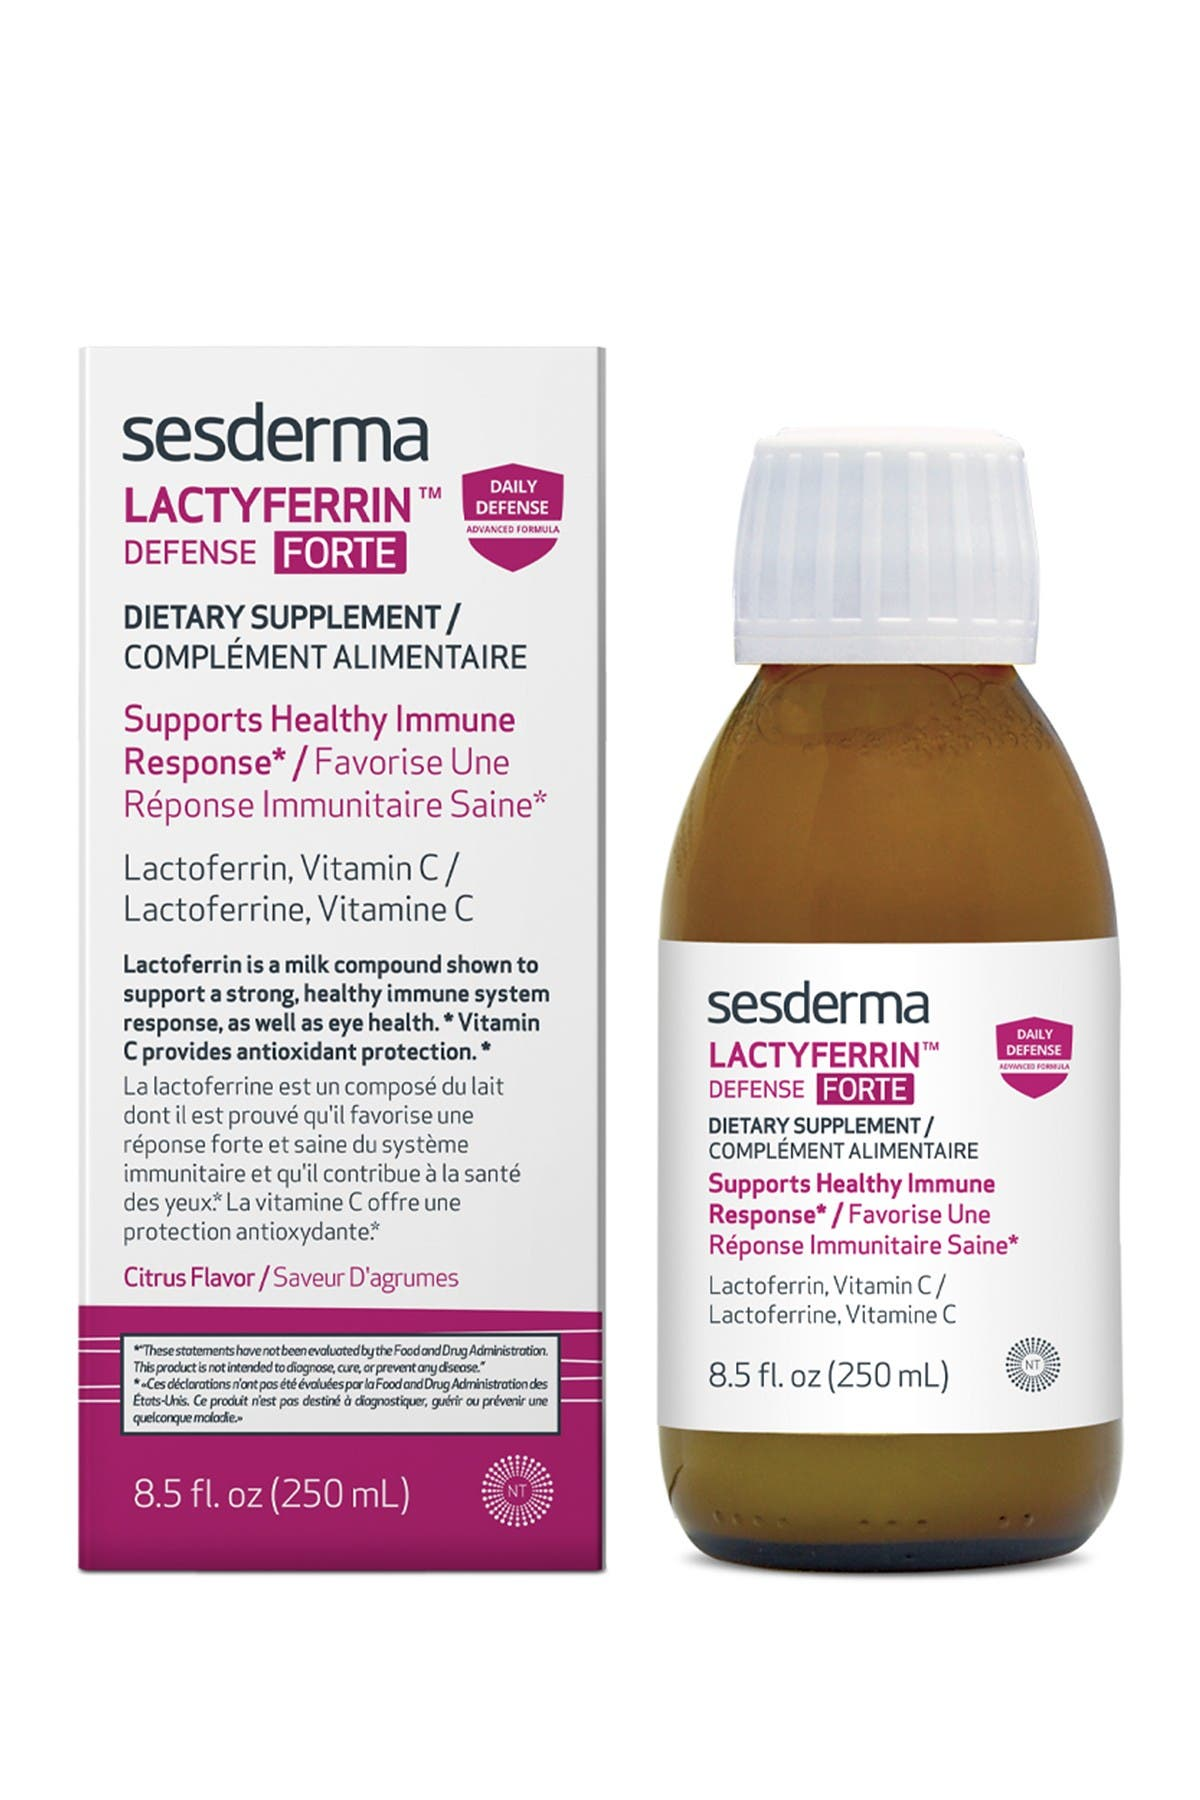 Image of Sesderma LACTYFERRIN DEFENSE FORTE Dietary Supplement